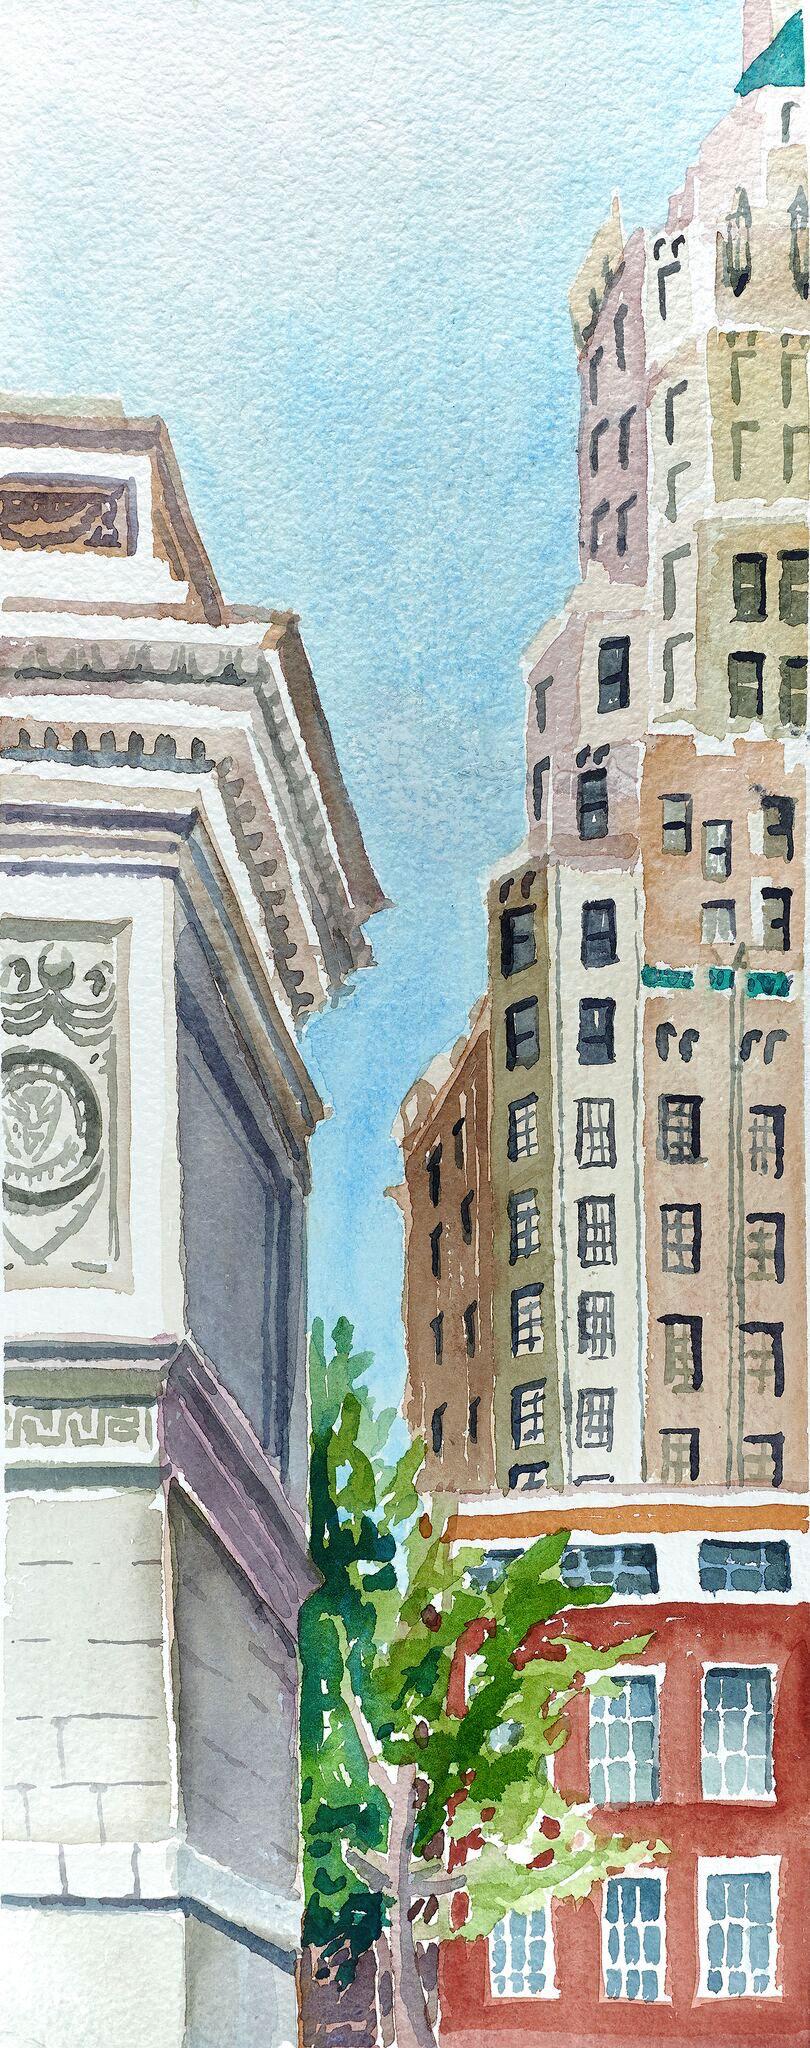 Washington Square Arch, 2016